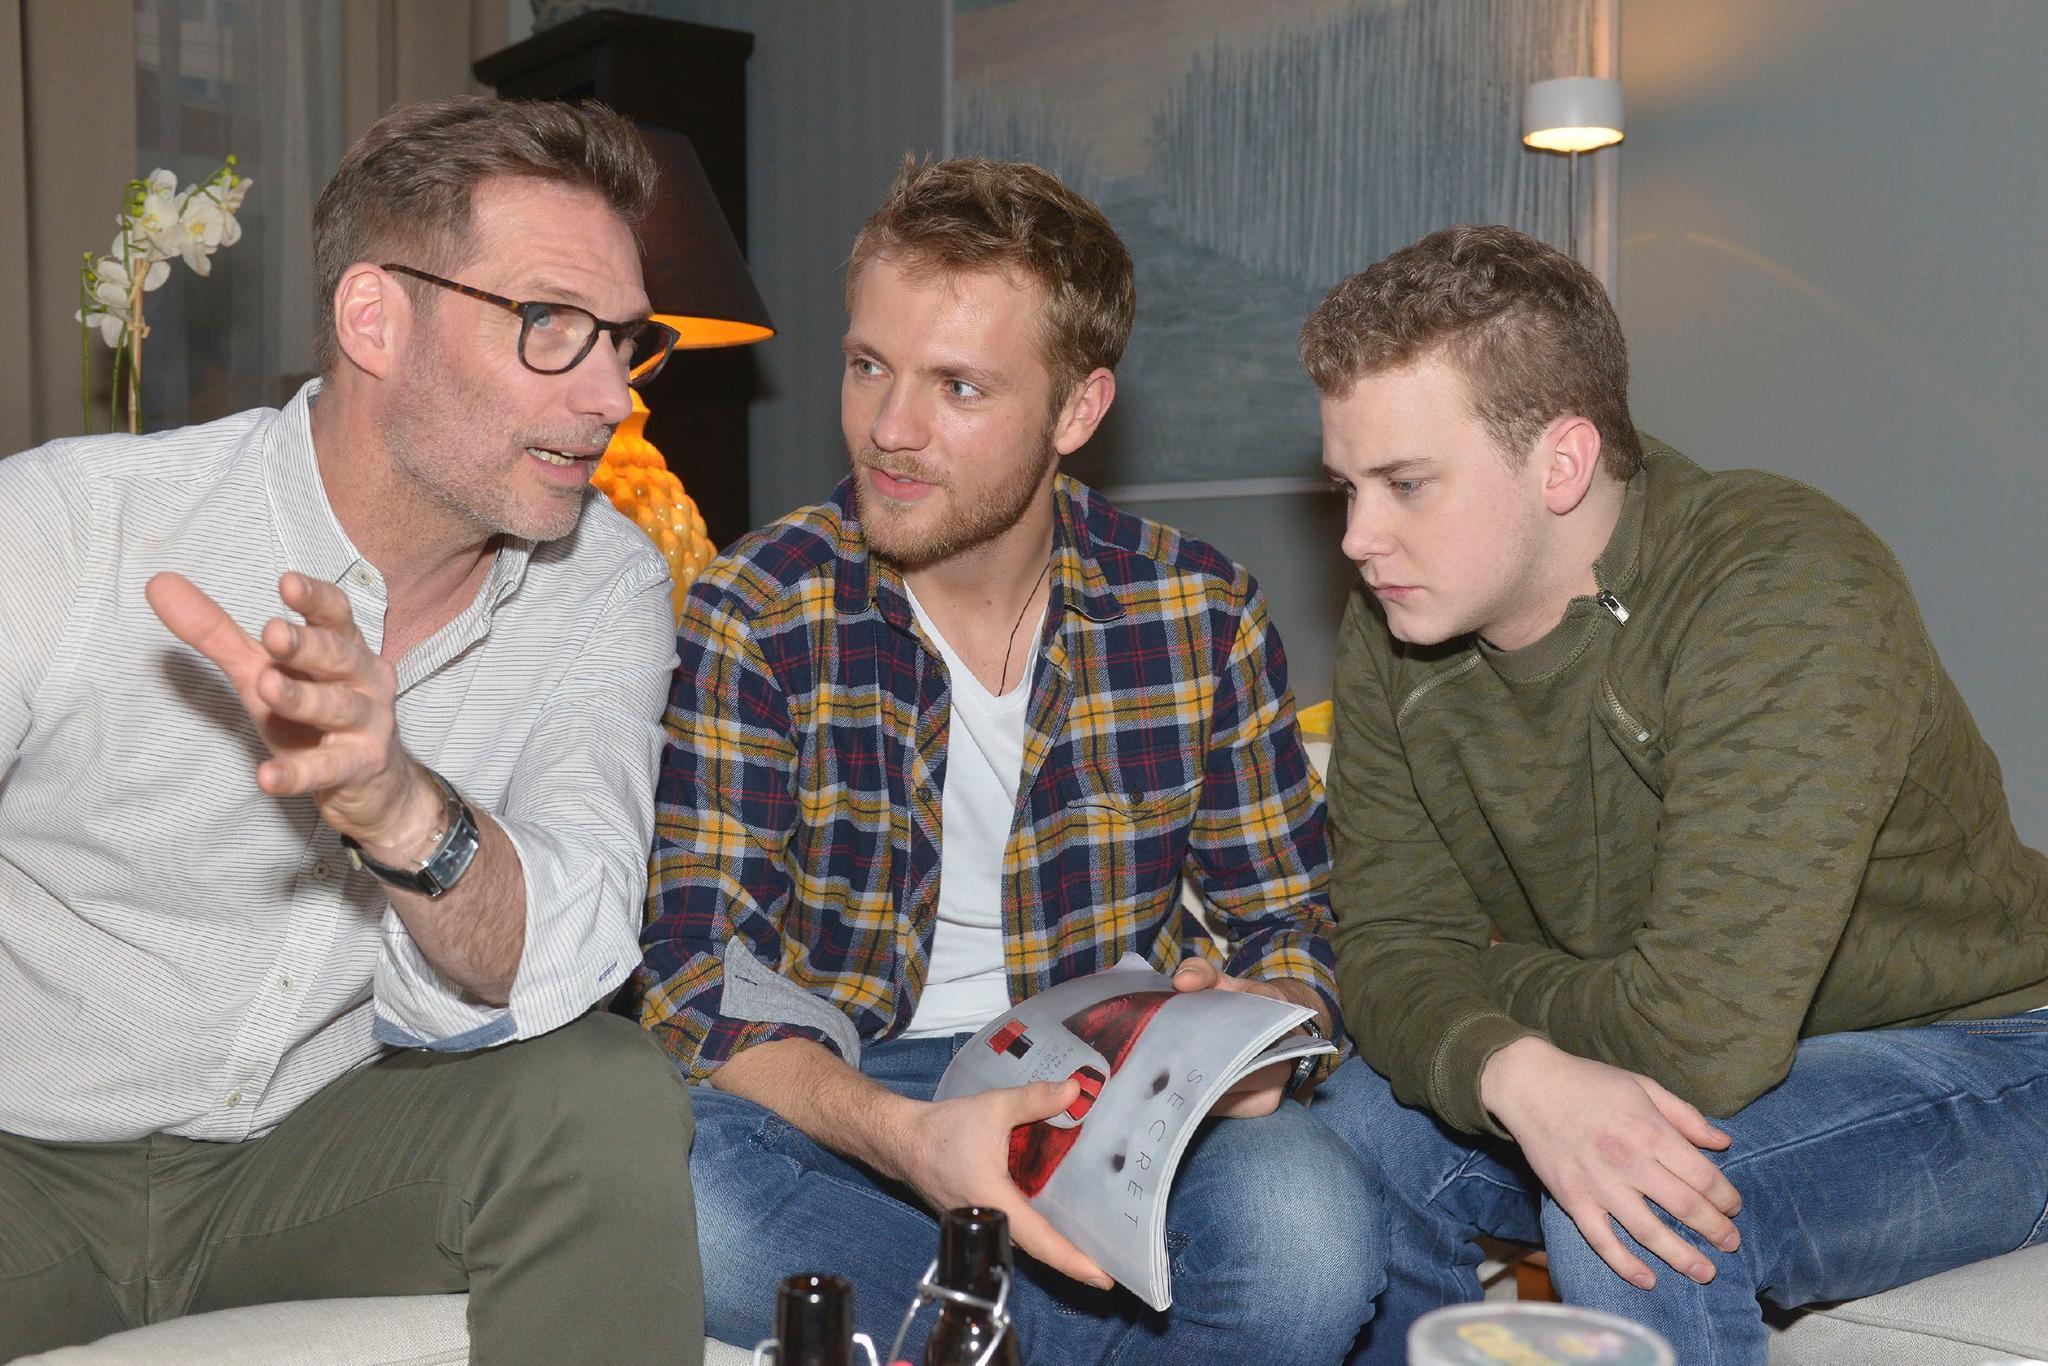 Alexander (Clemens Löhr), Paul (Niklas Osterloh) und Jonas (Felix van Deventer)